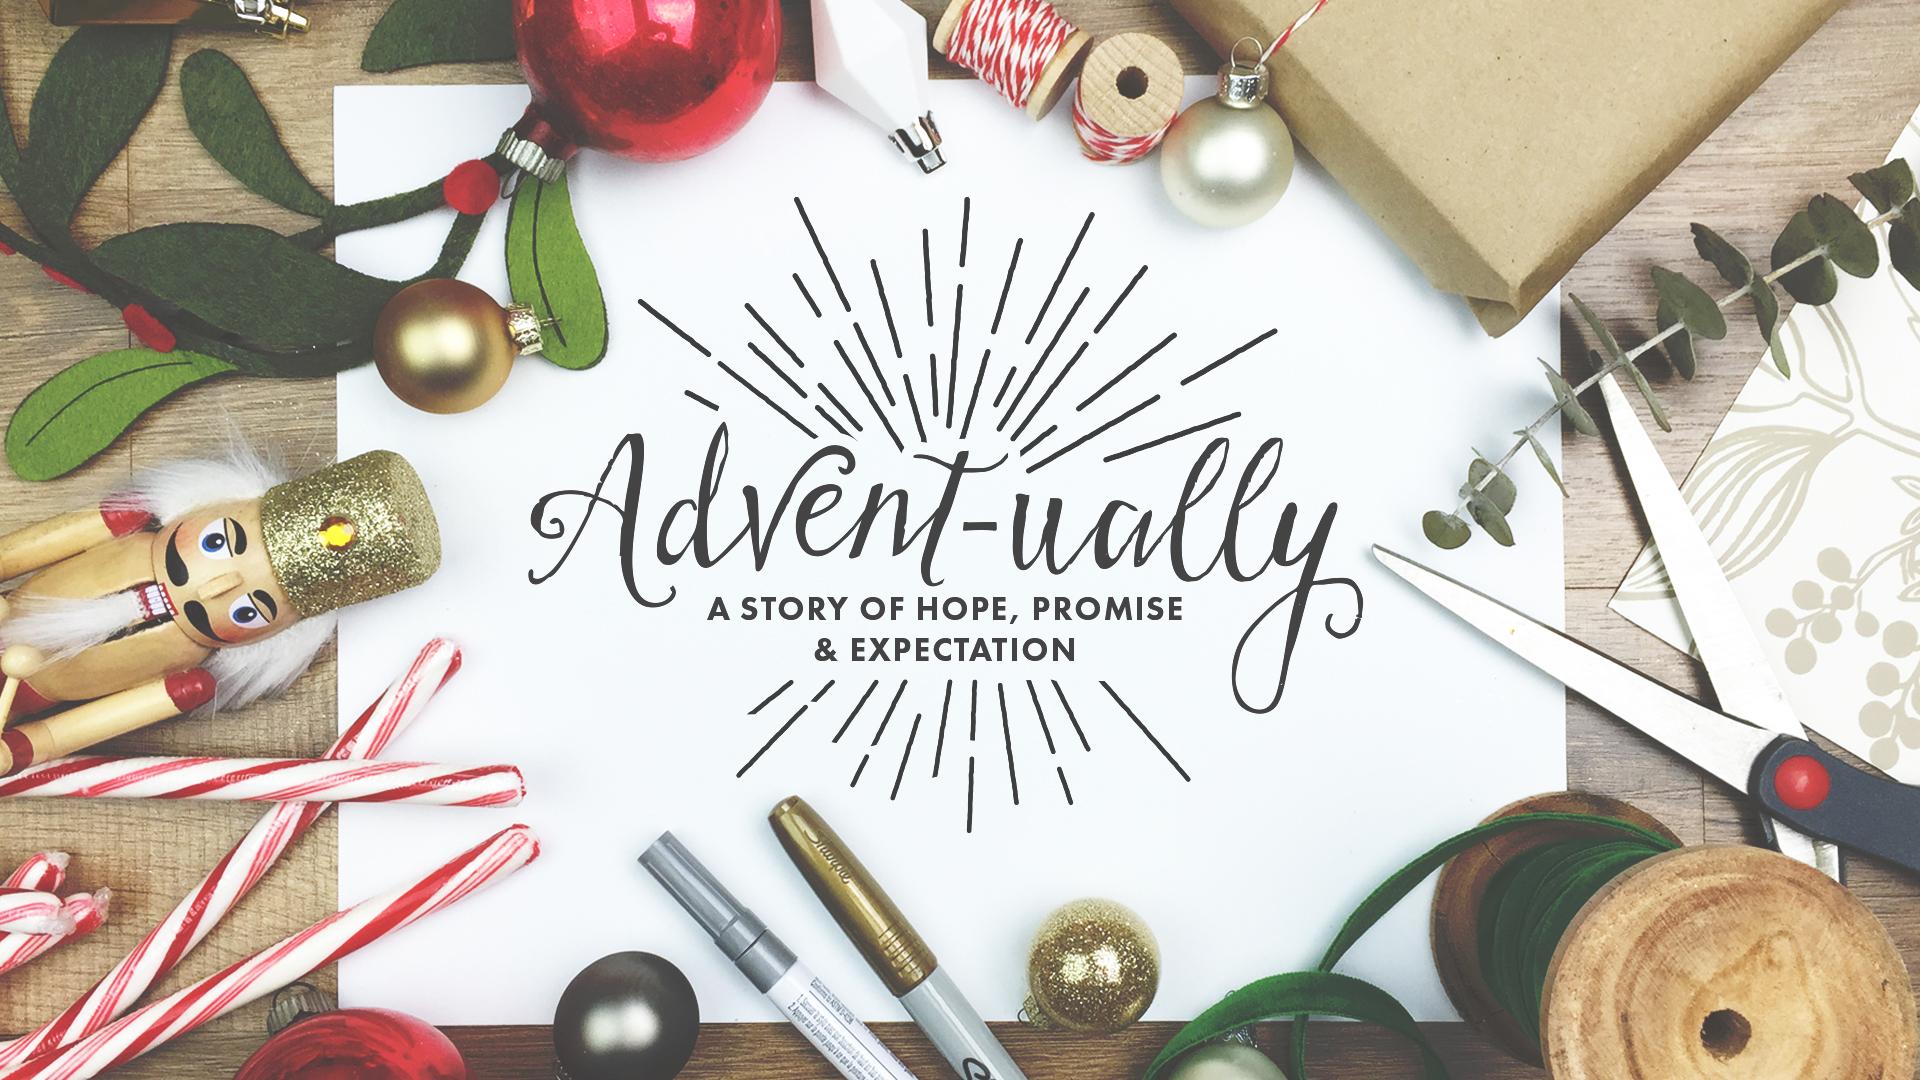 Advent-ually – Church Sermon Series Ideas |Worship Service Advent Ideas